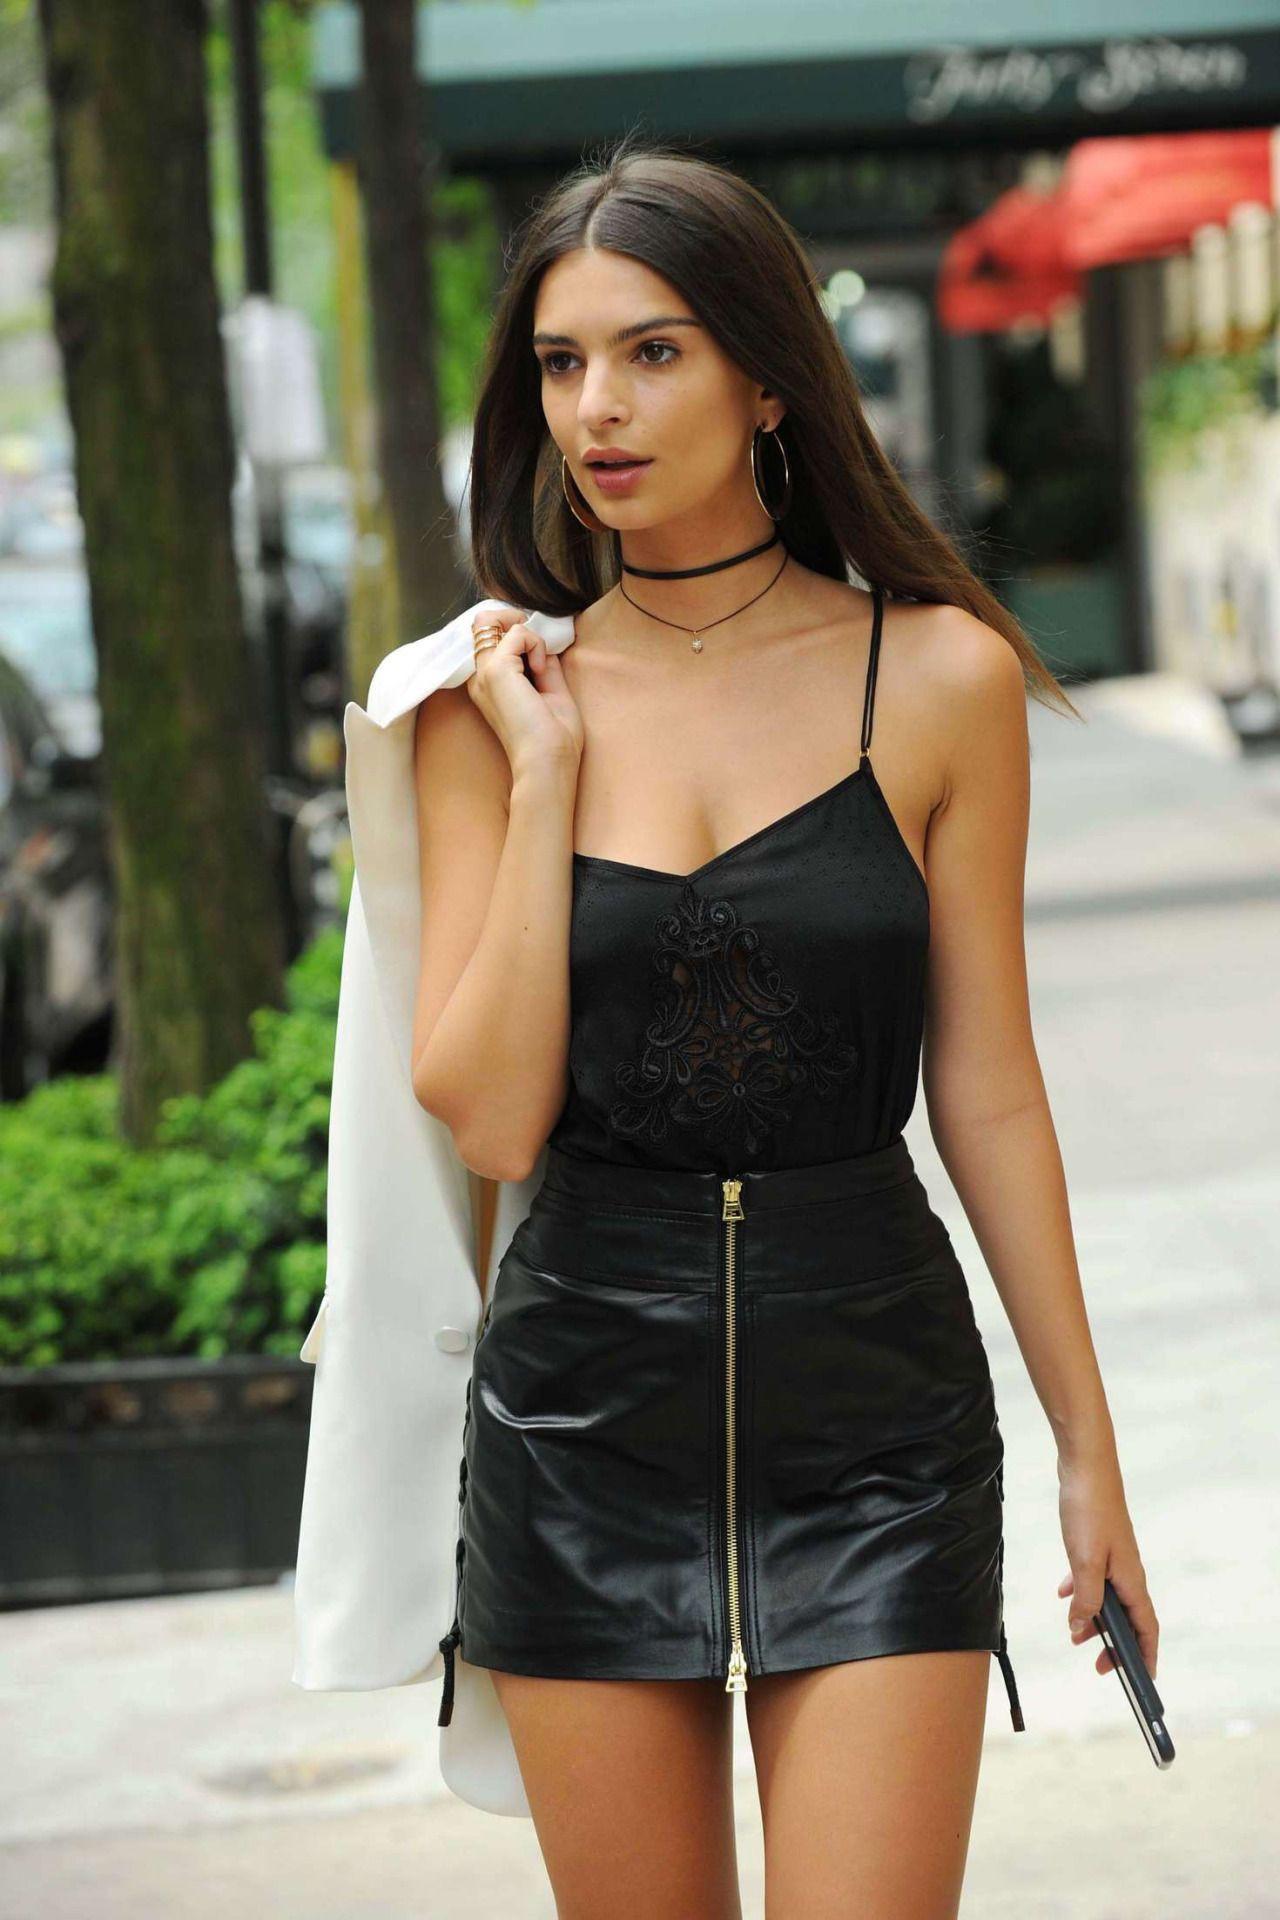 Emily ratajkowski mini skirt little black dress, emily ratajkowski